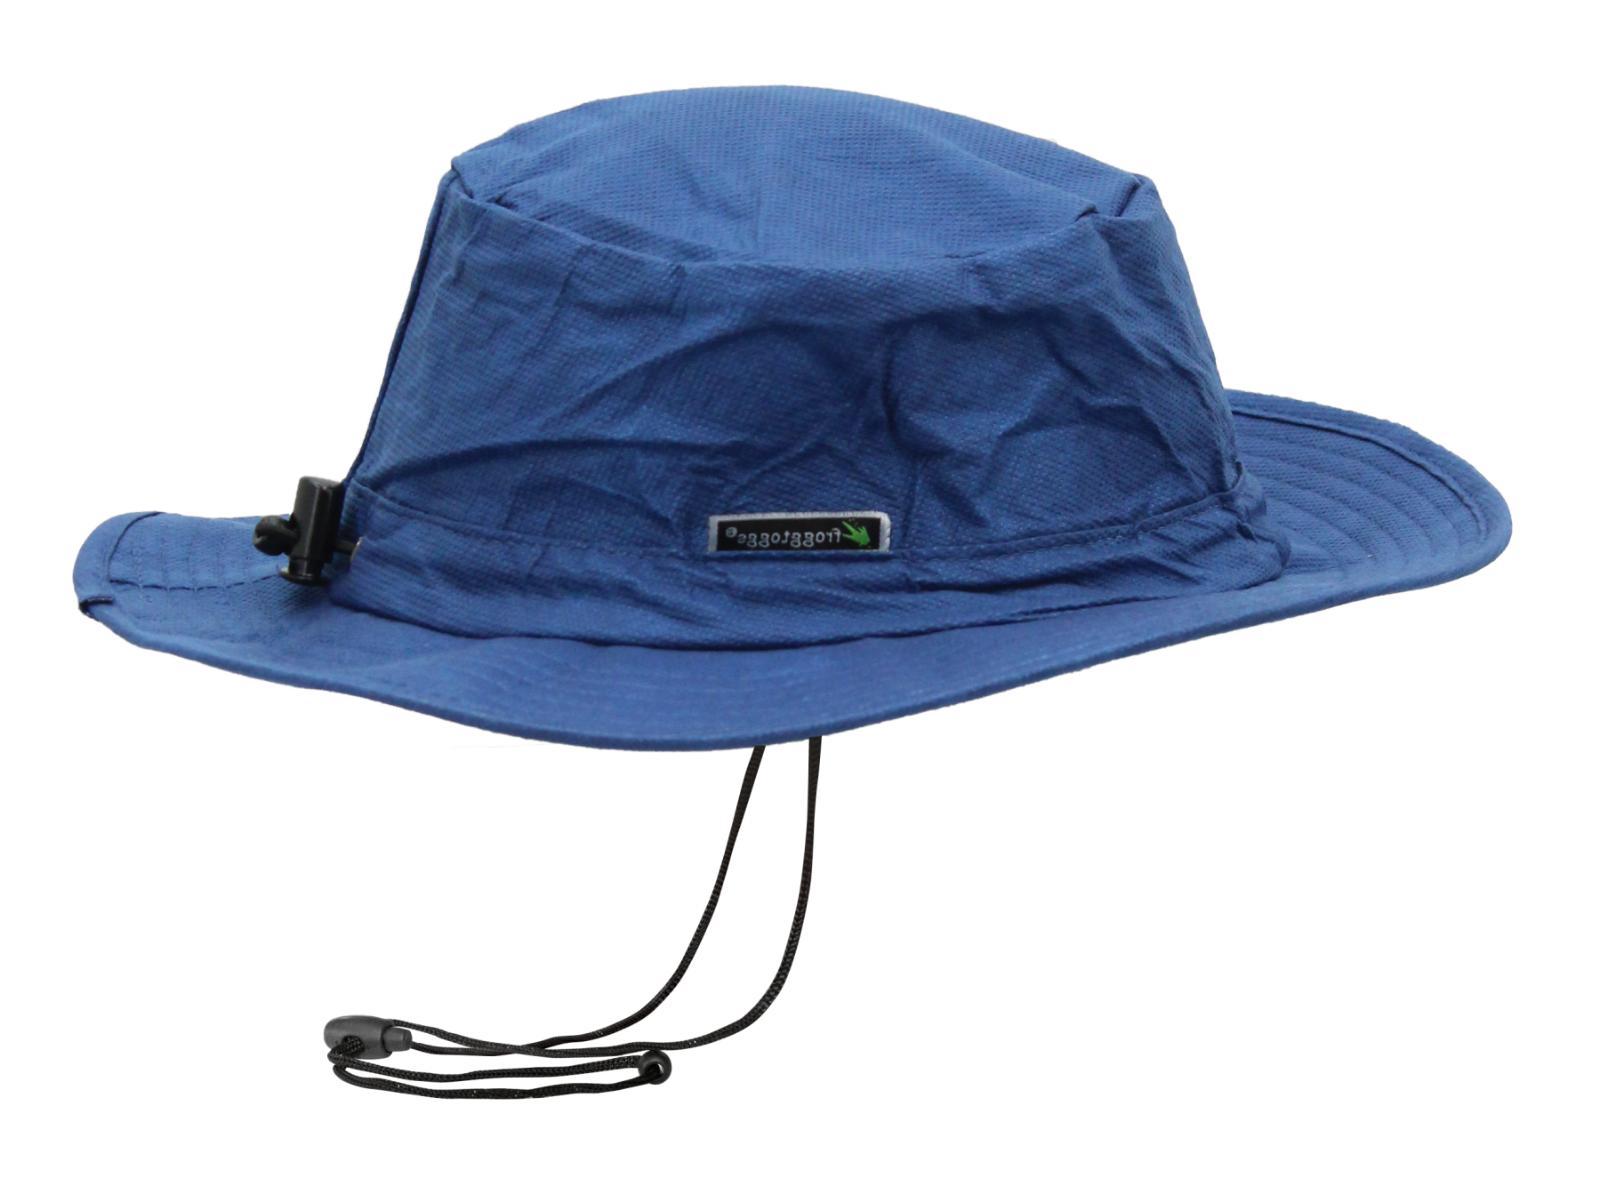 breathable waterproof royal blue rain gear